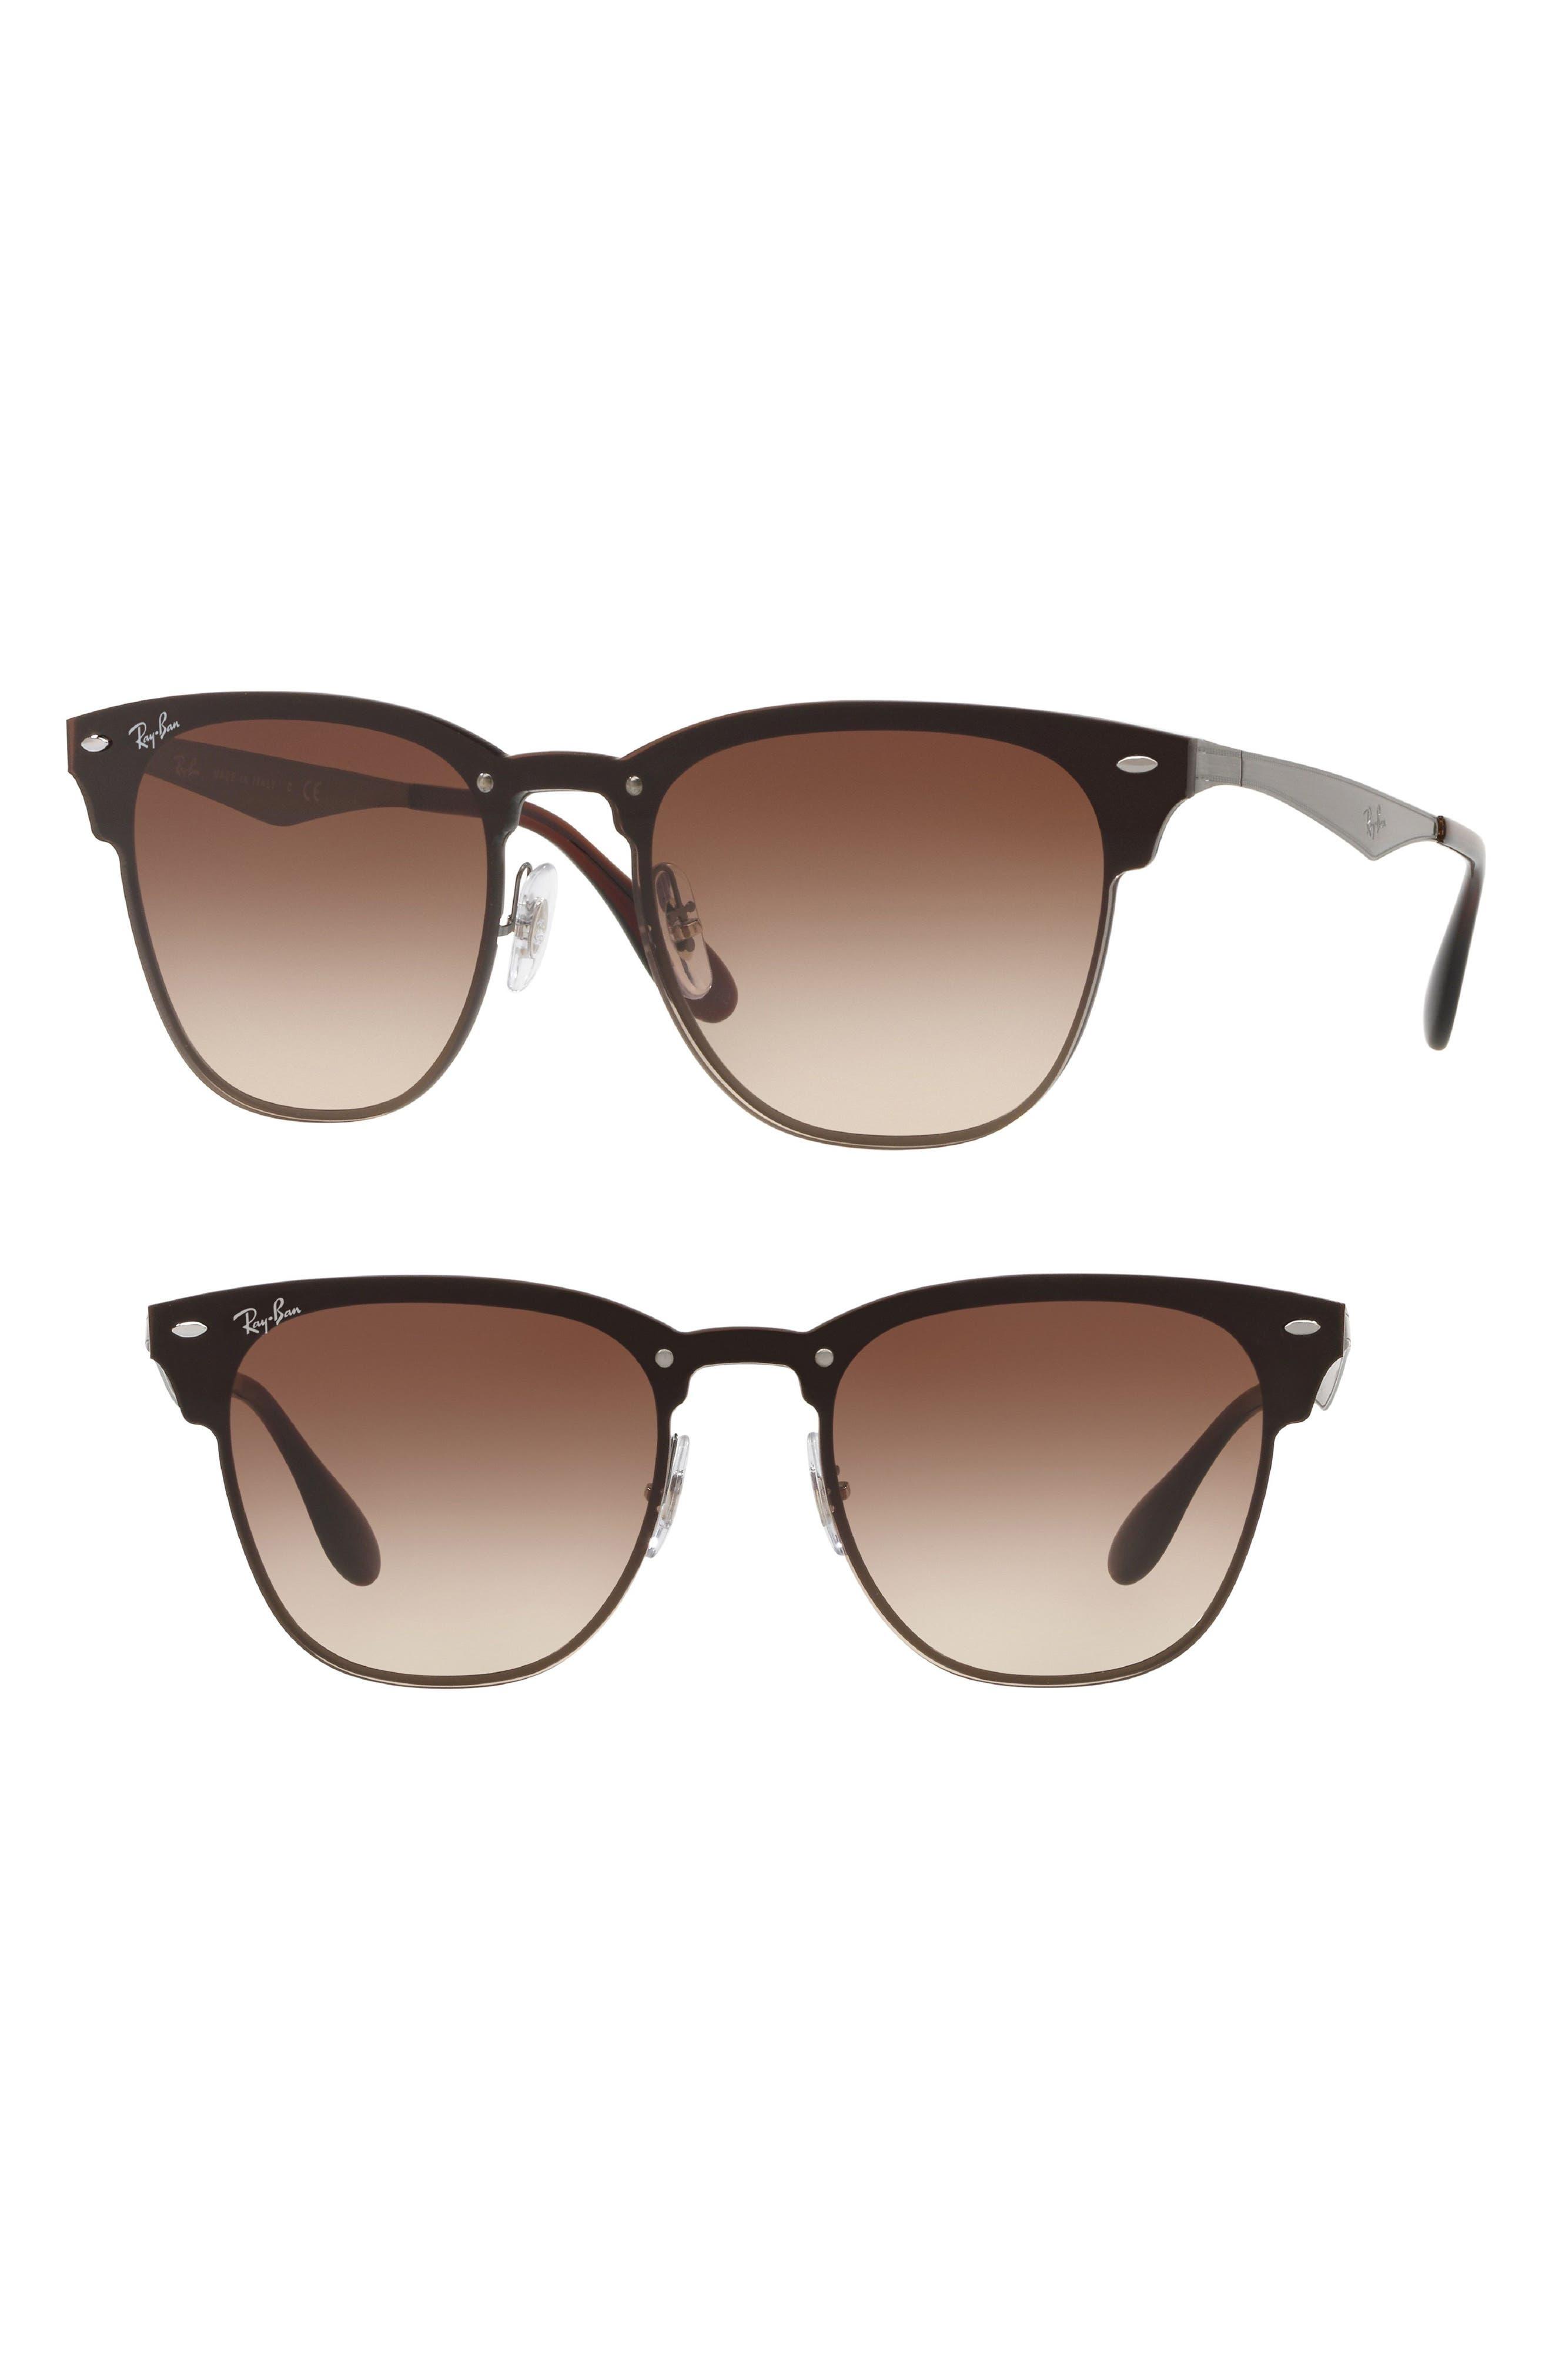 Blaze Clubmaster 47mm Sunglasses,                         Main,                         color, Gunmetal